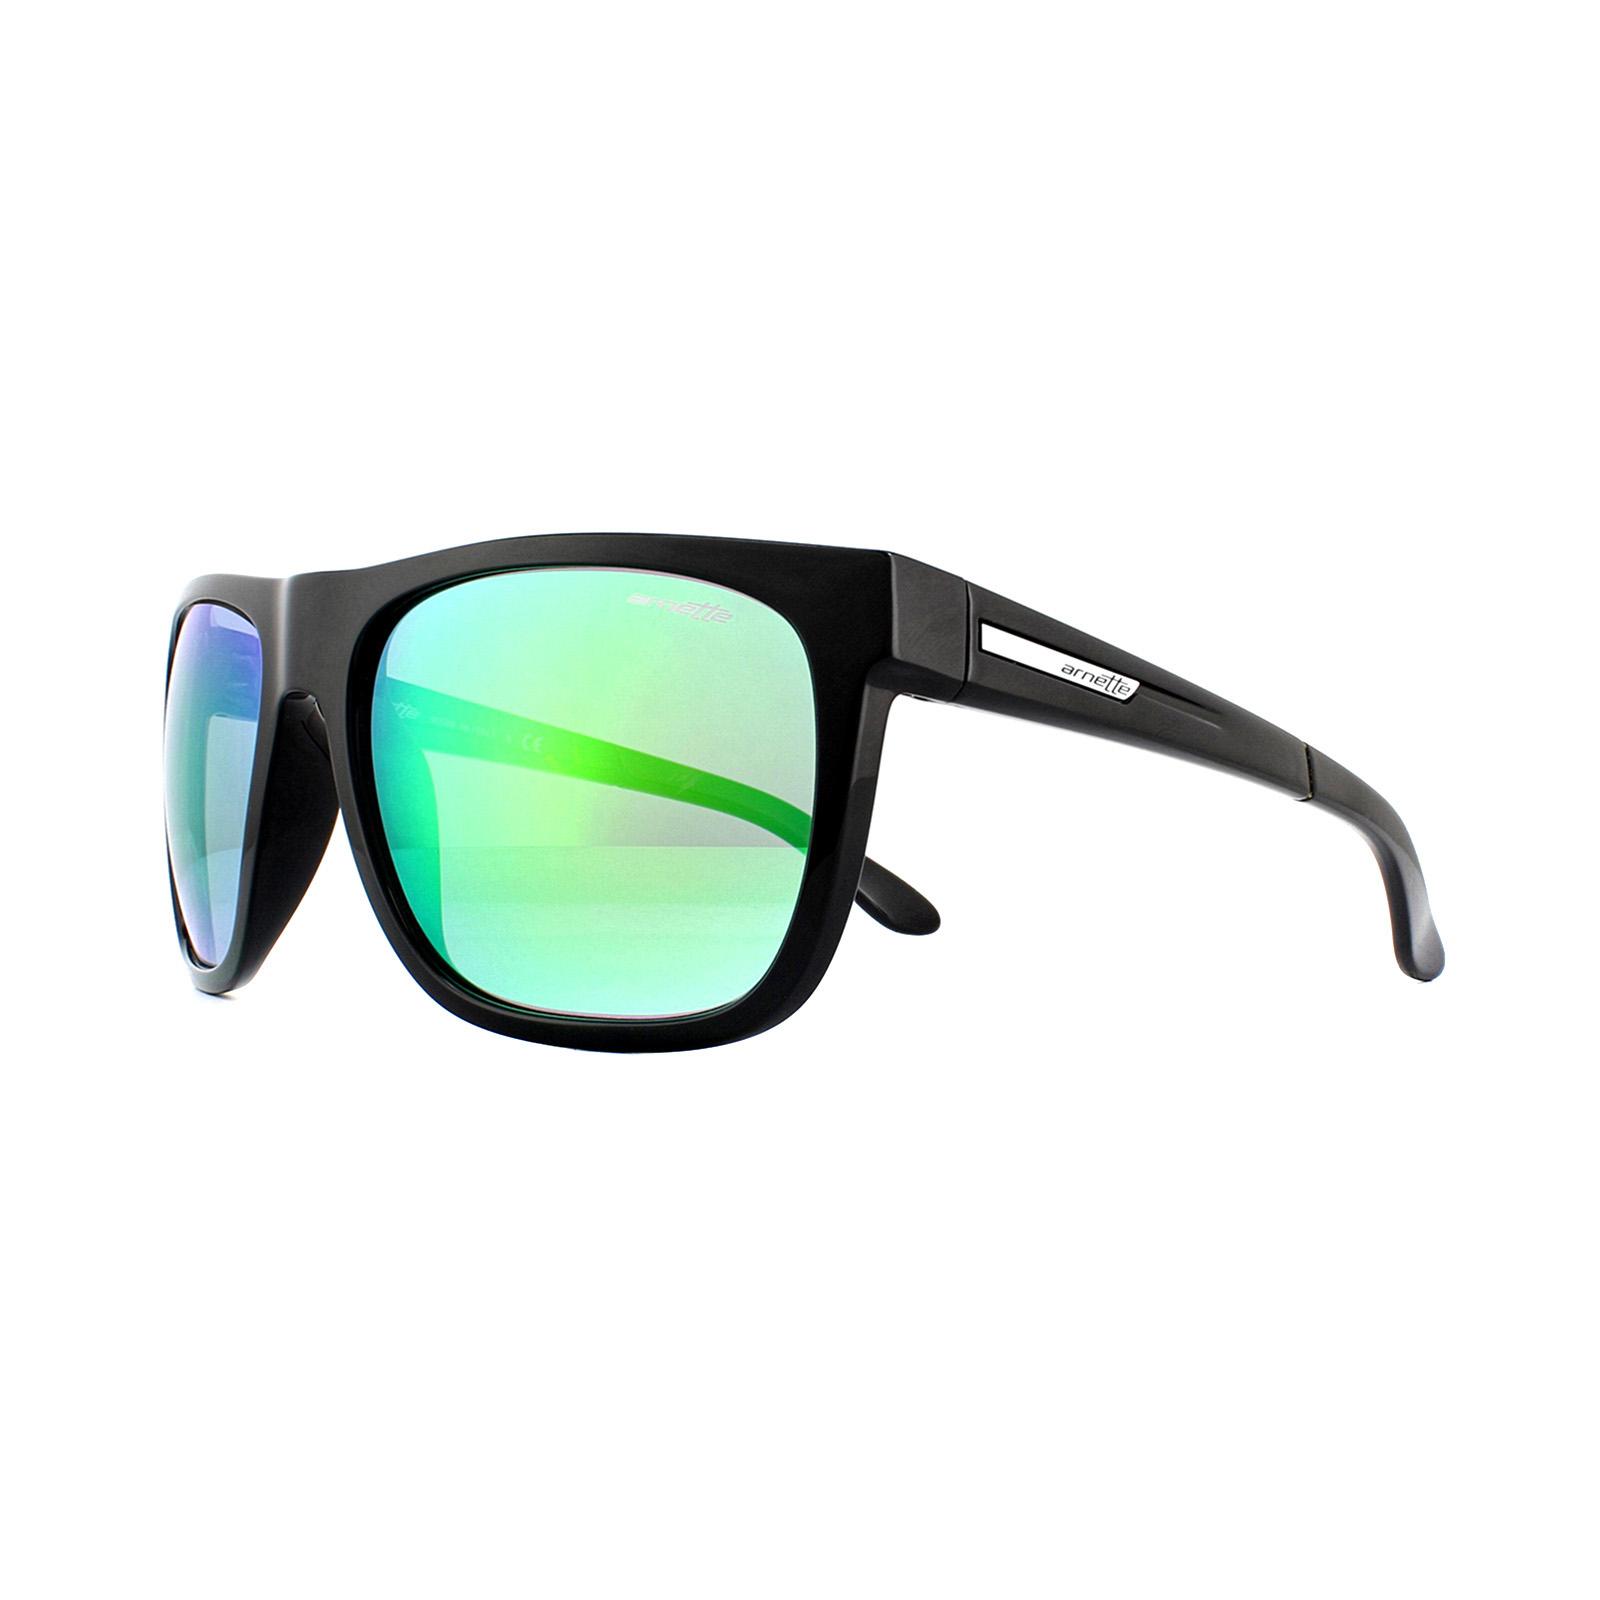 58018a081c5b Cheap Arnette 4143 Fire Drill Sunglasses - Discounted Sunglasses